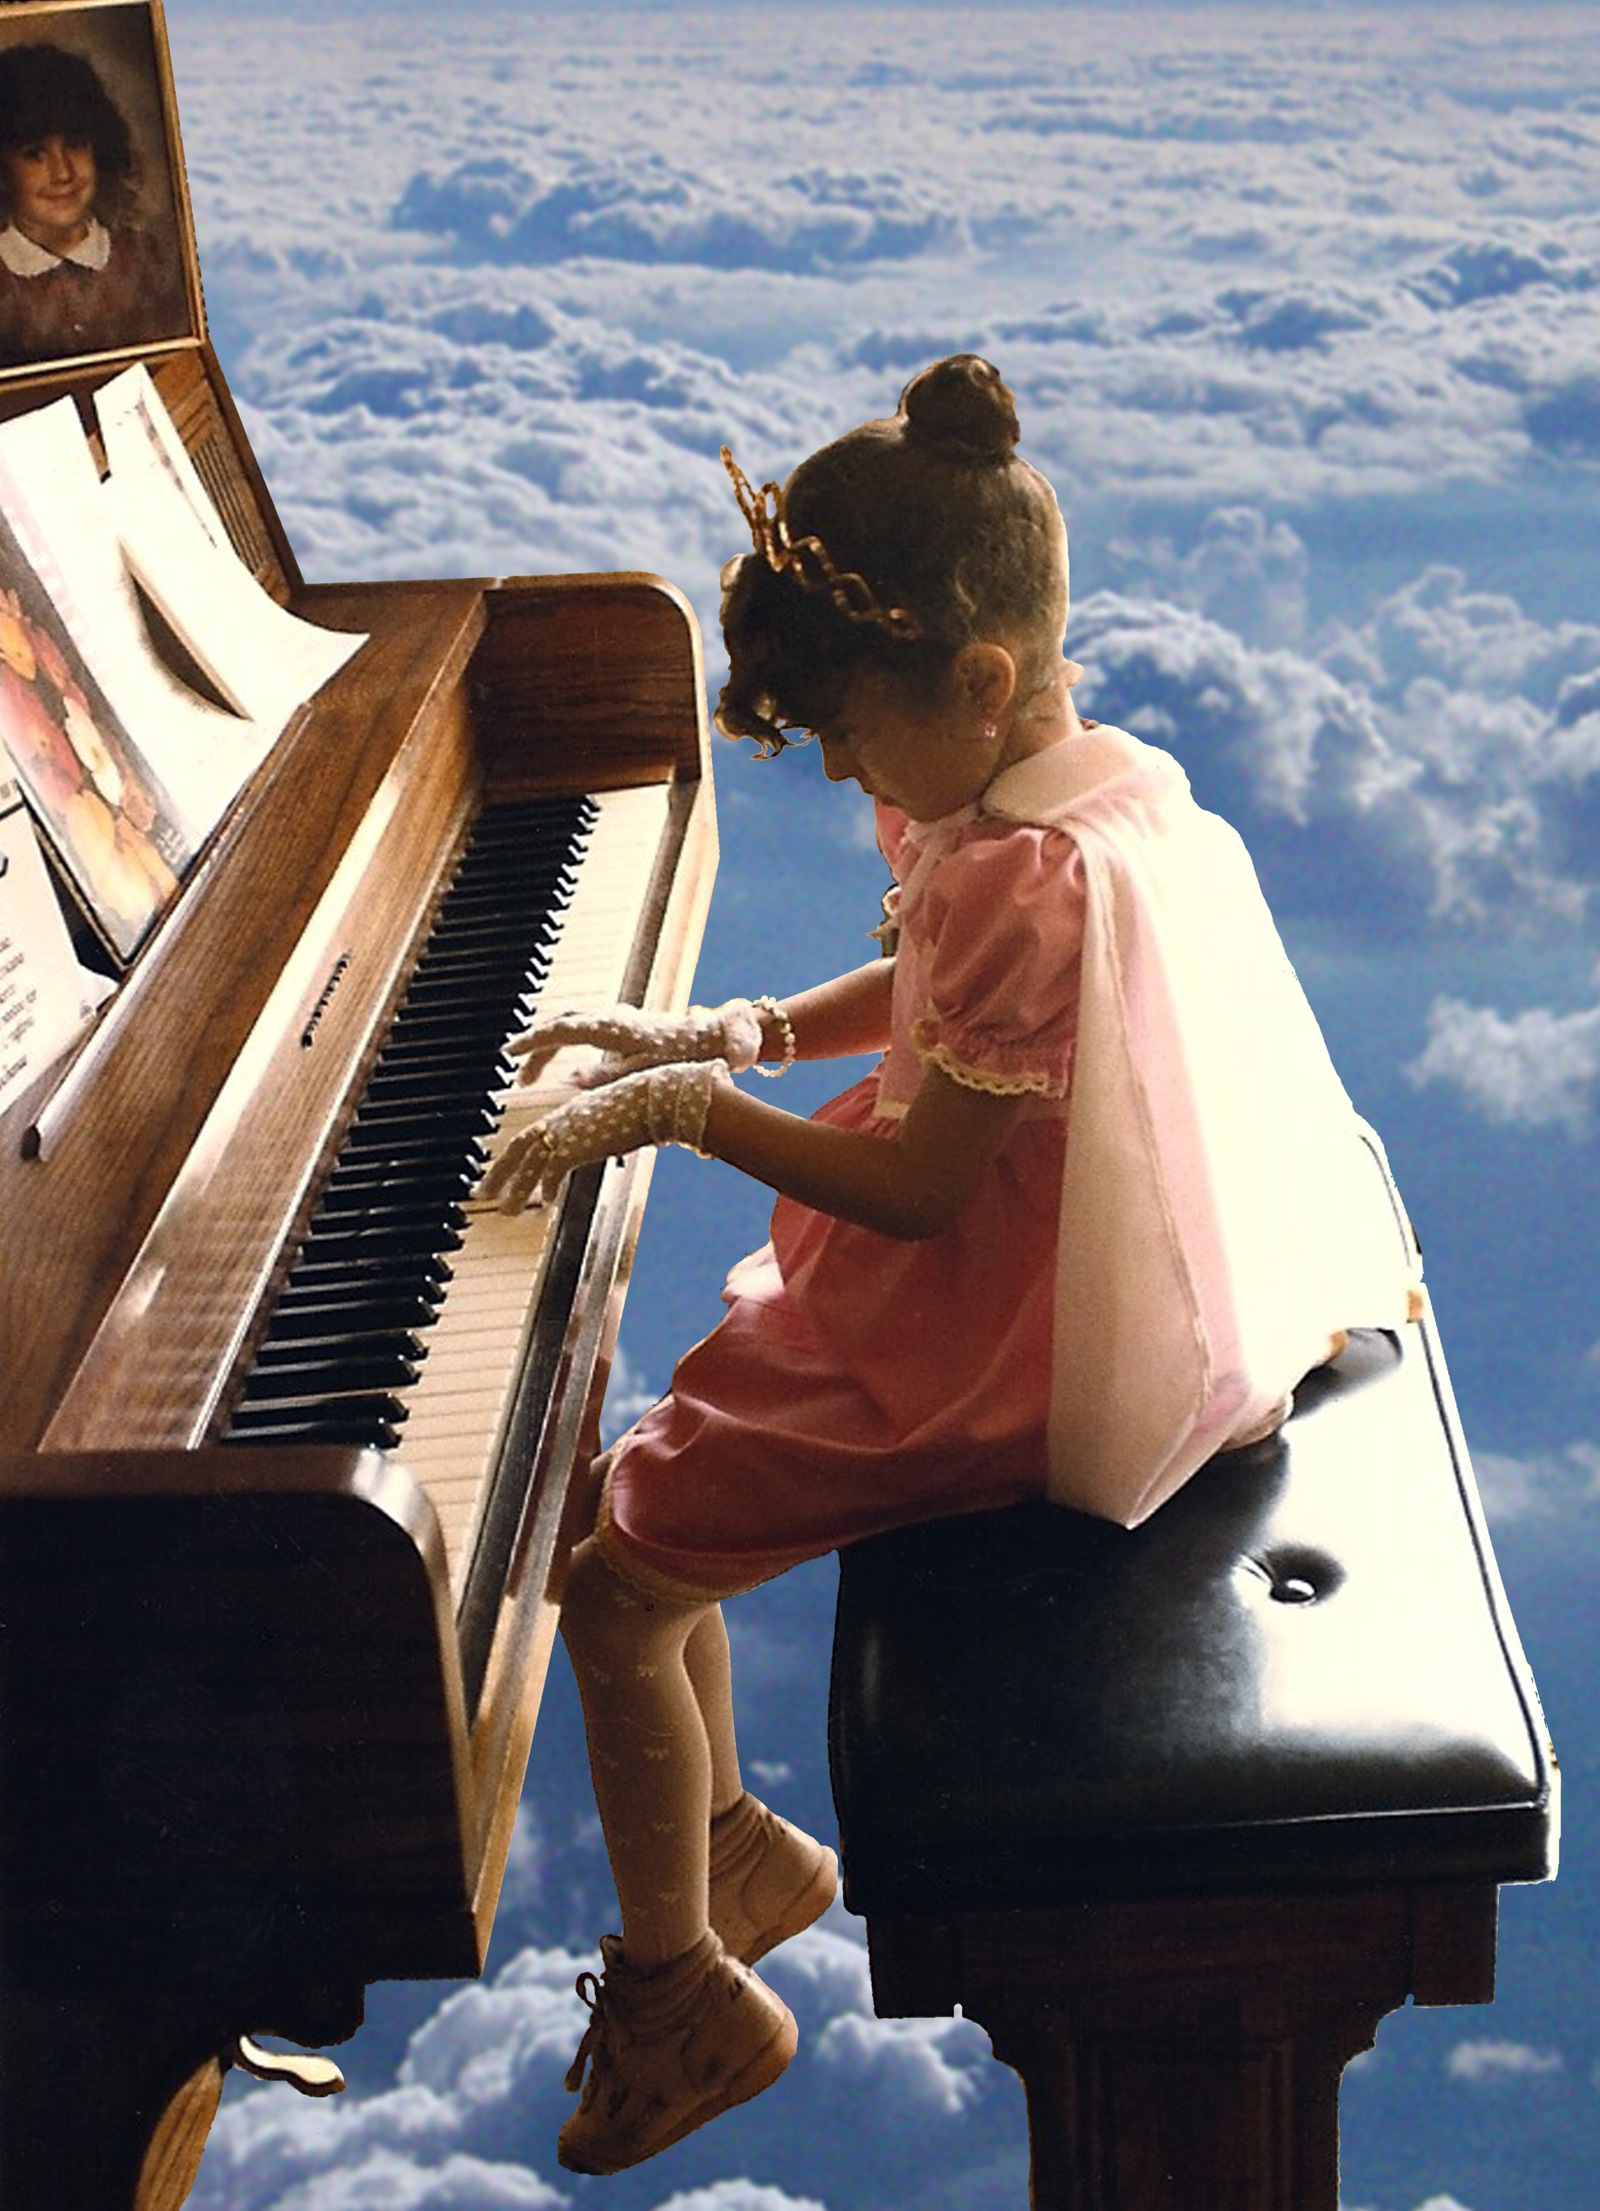 020 kid alu piano 300dpi 1600.jpg